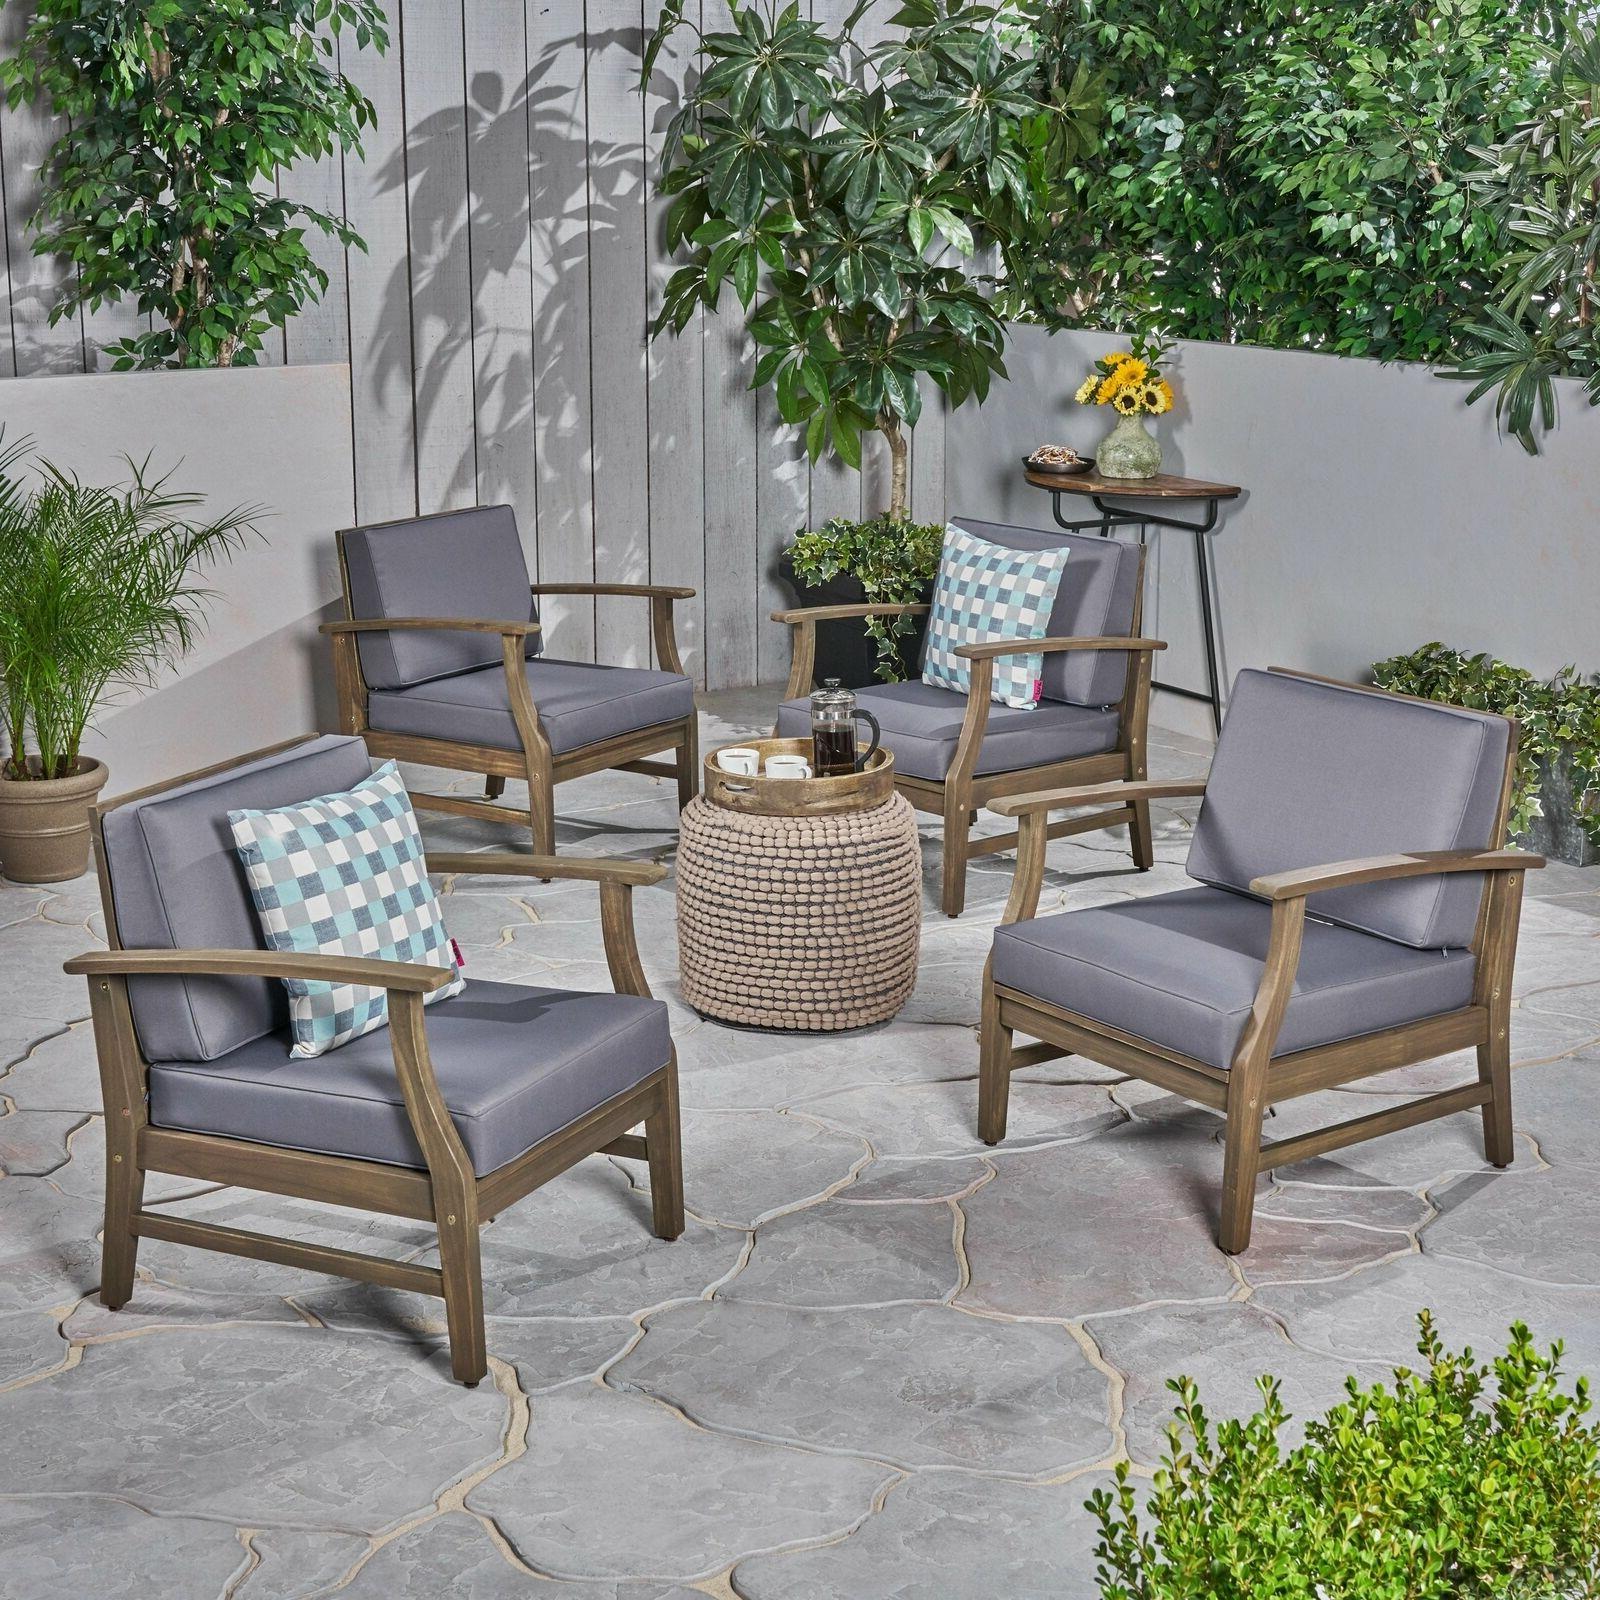 2020 Perla Outdoor Acacia Wood Club Chair With Cushion (set Of 4) Gray Finish + Dark Inside Perla Outdoor Acacia Wood Chaise Lounge With Cushion (View 19 of 25)